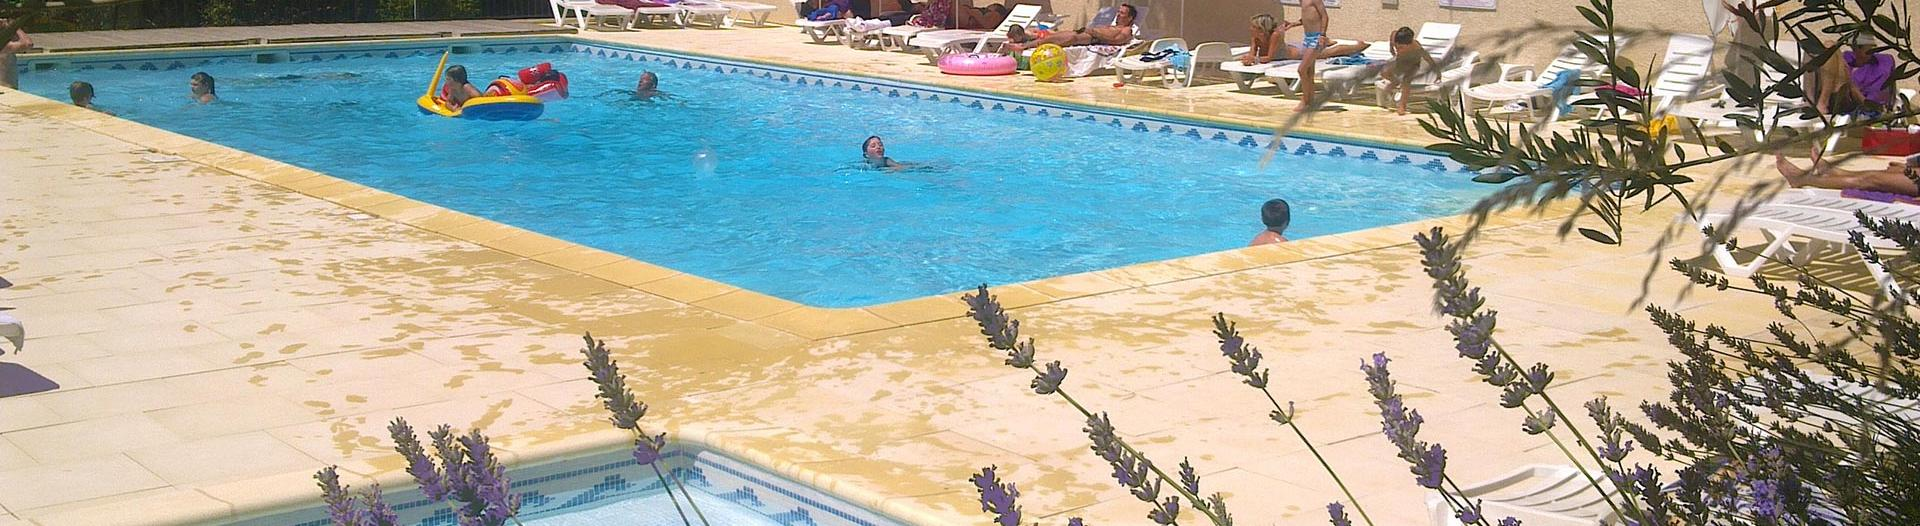 slider-camping-fontisson-piscine-lavande